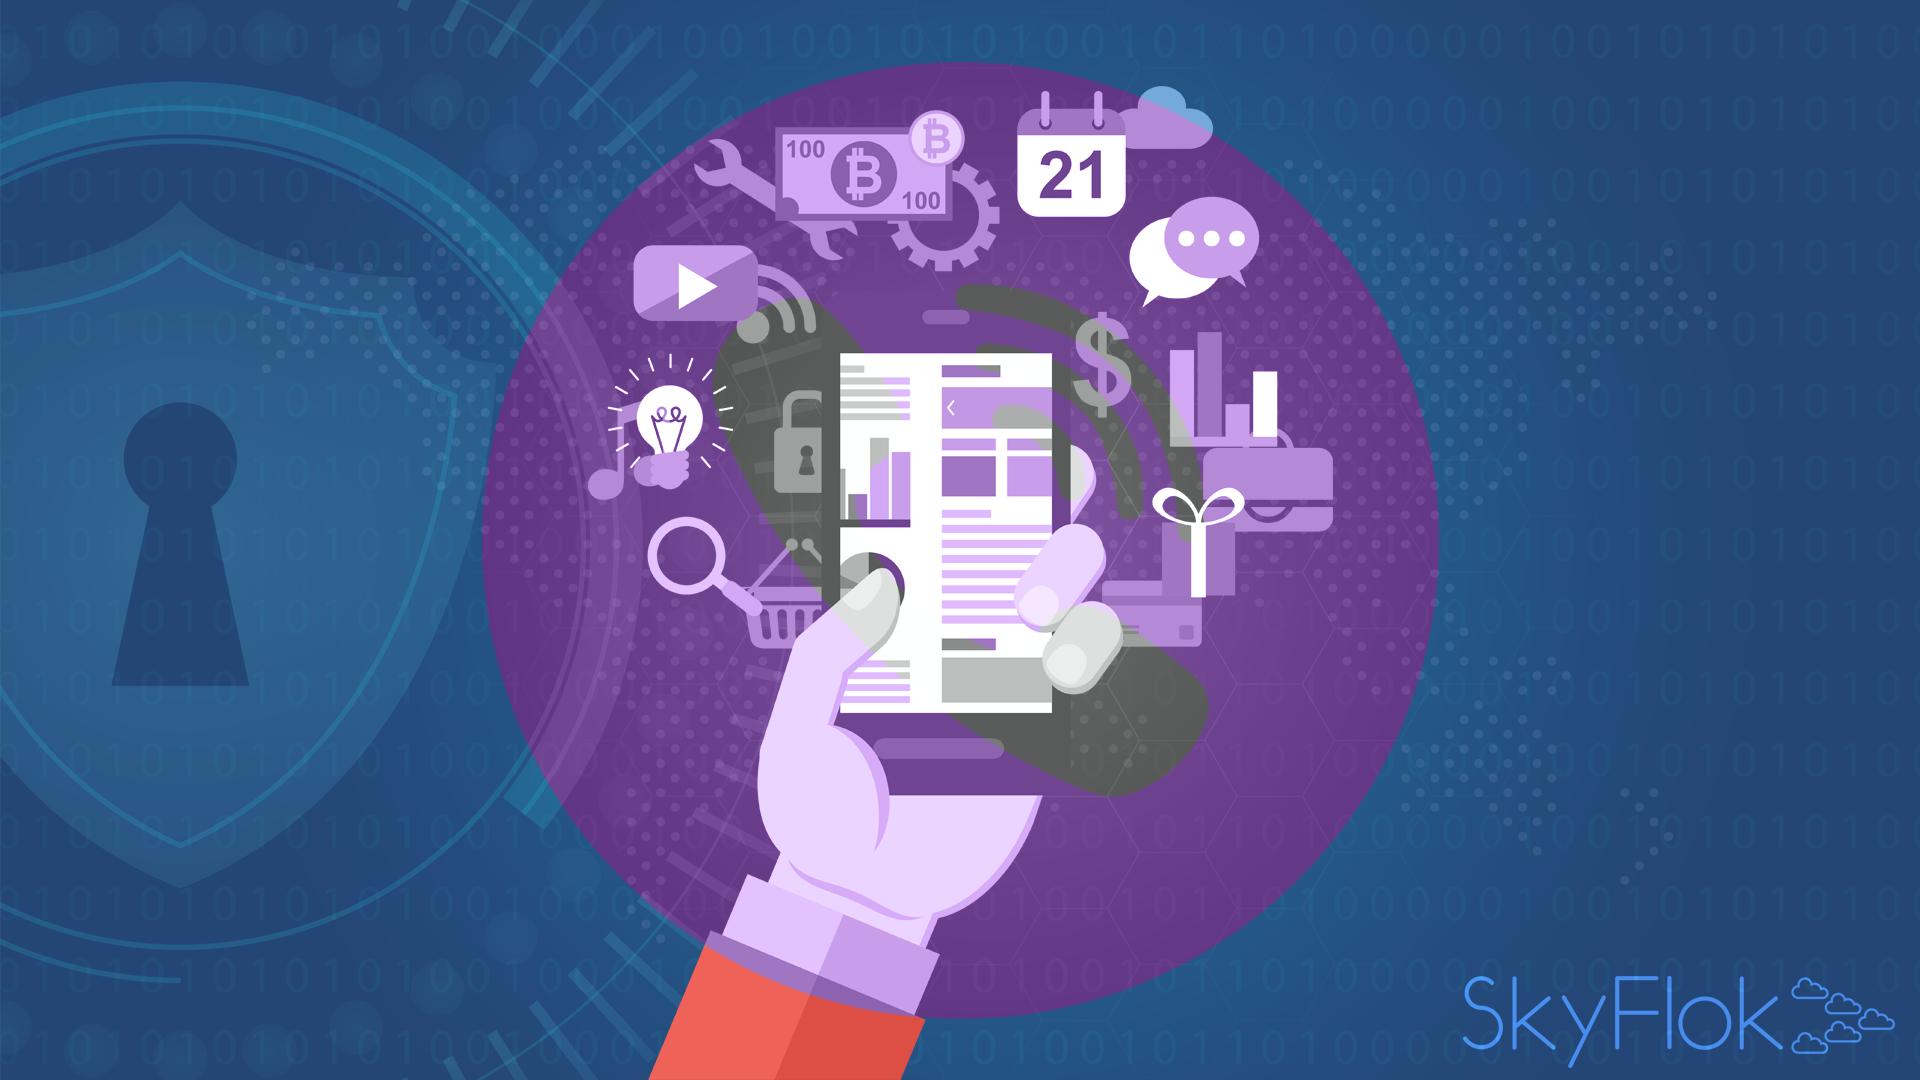 Viber Survey Highlights Key Consumer Data Privacy Concerns